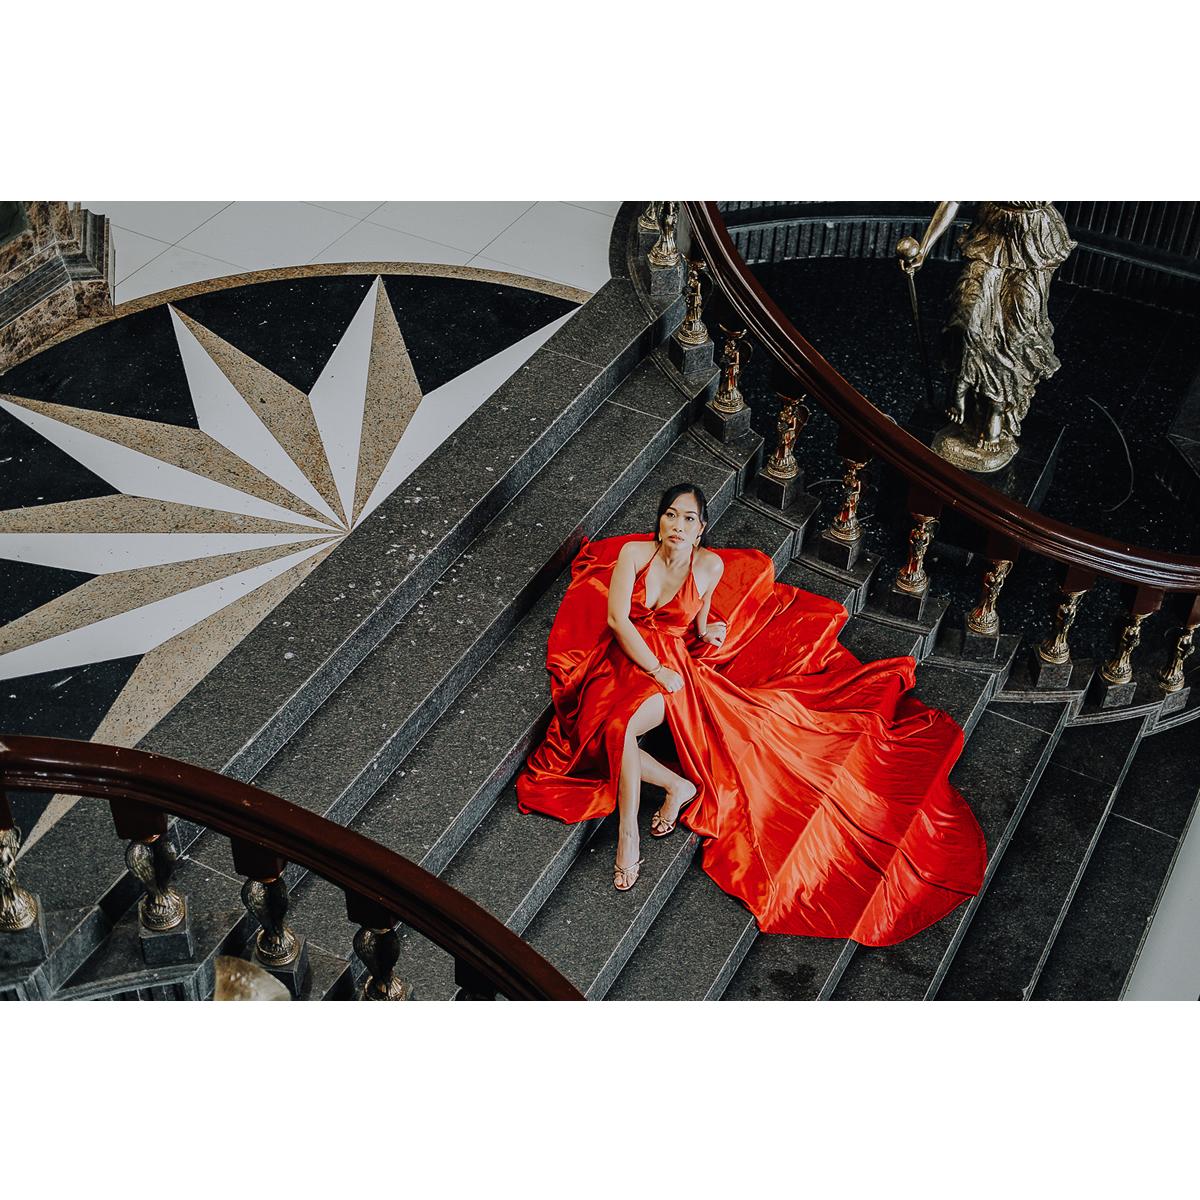 Cebu Portrait Session, Temple of Leah Photoshoot